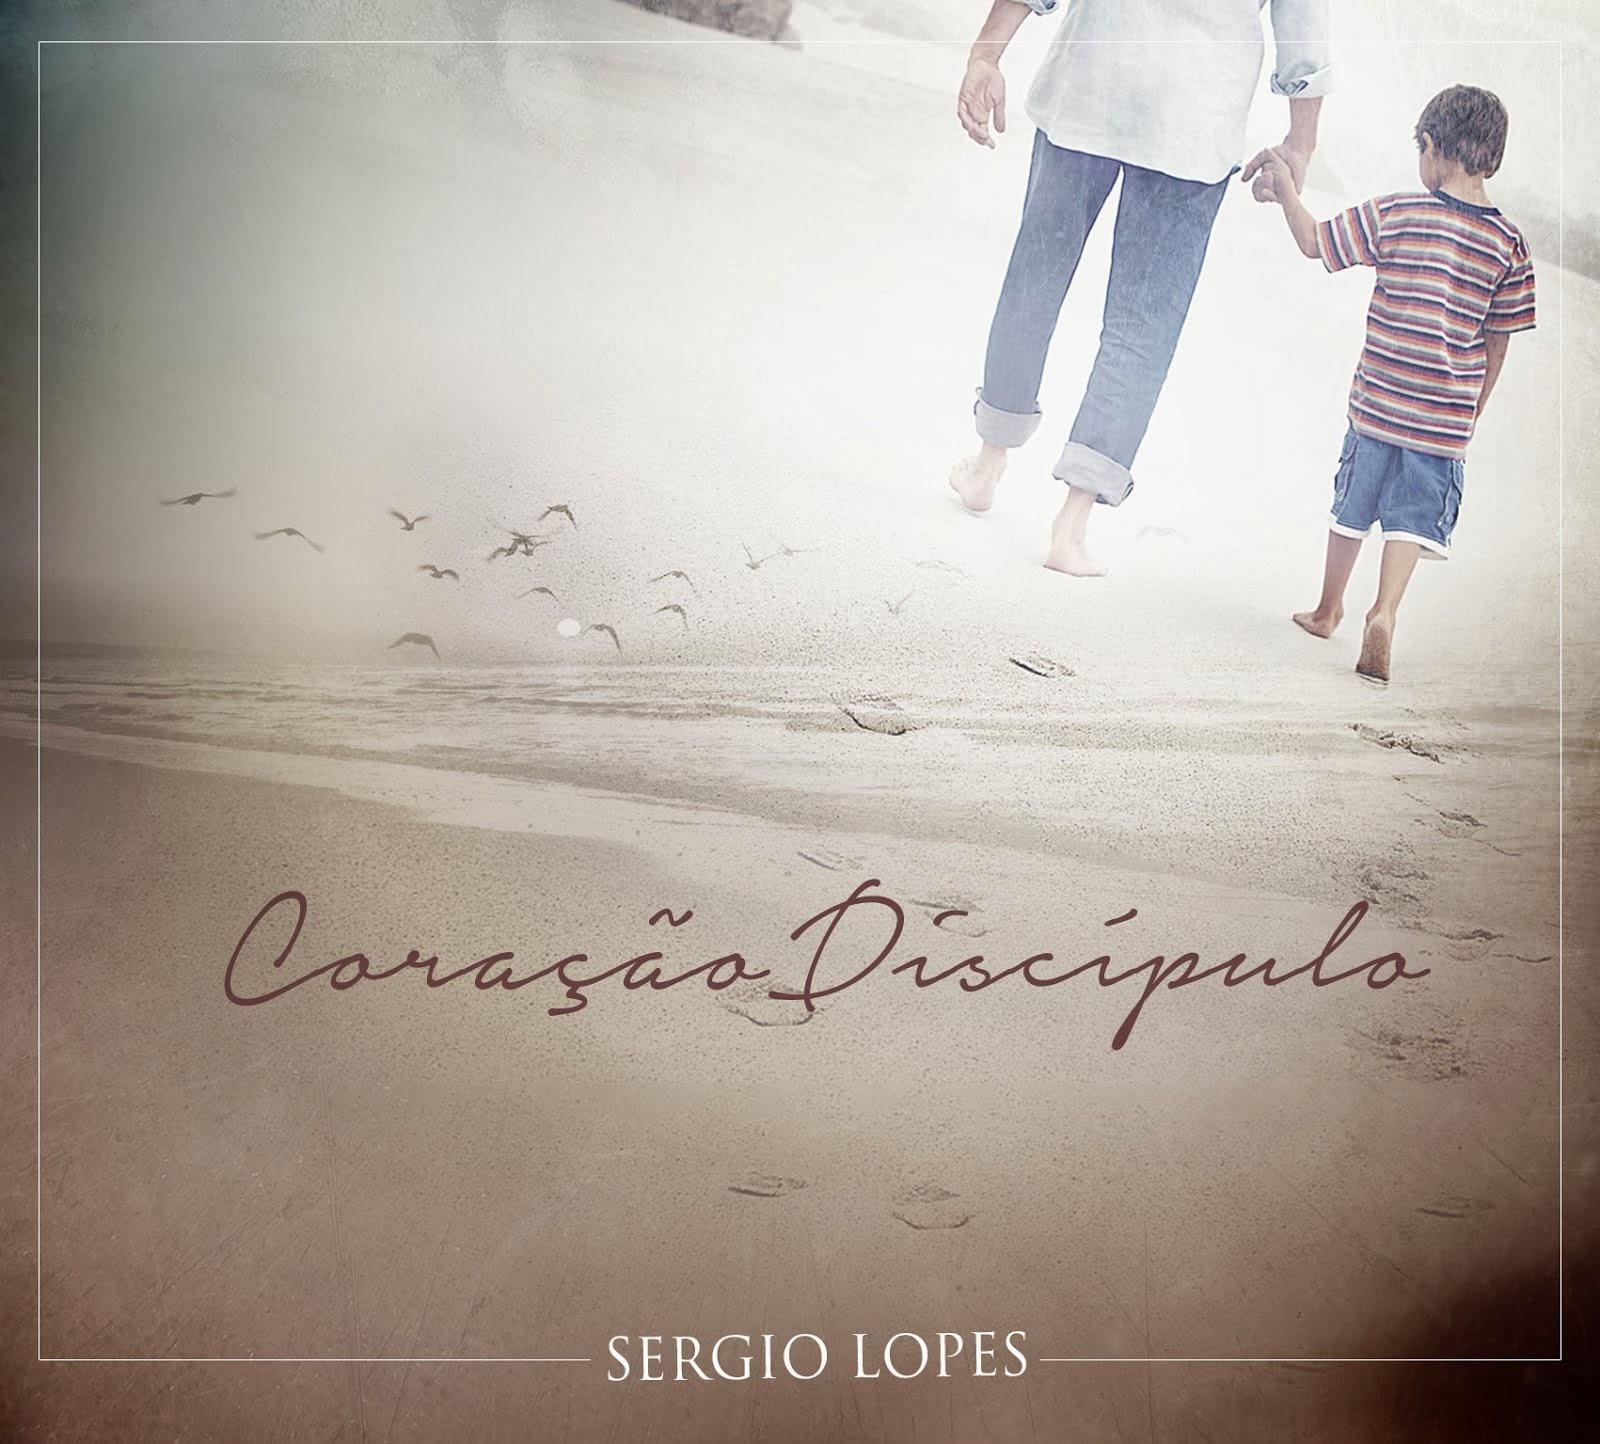 O Amor Vencerá, Sergio Lopes